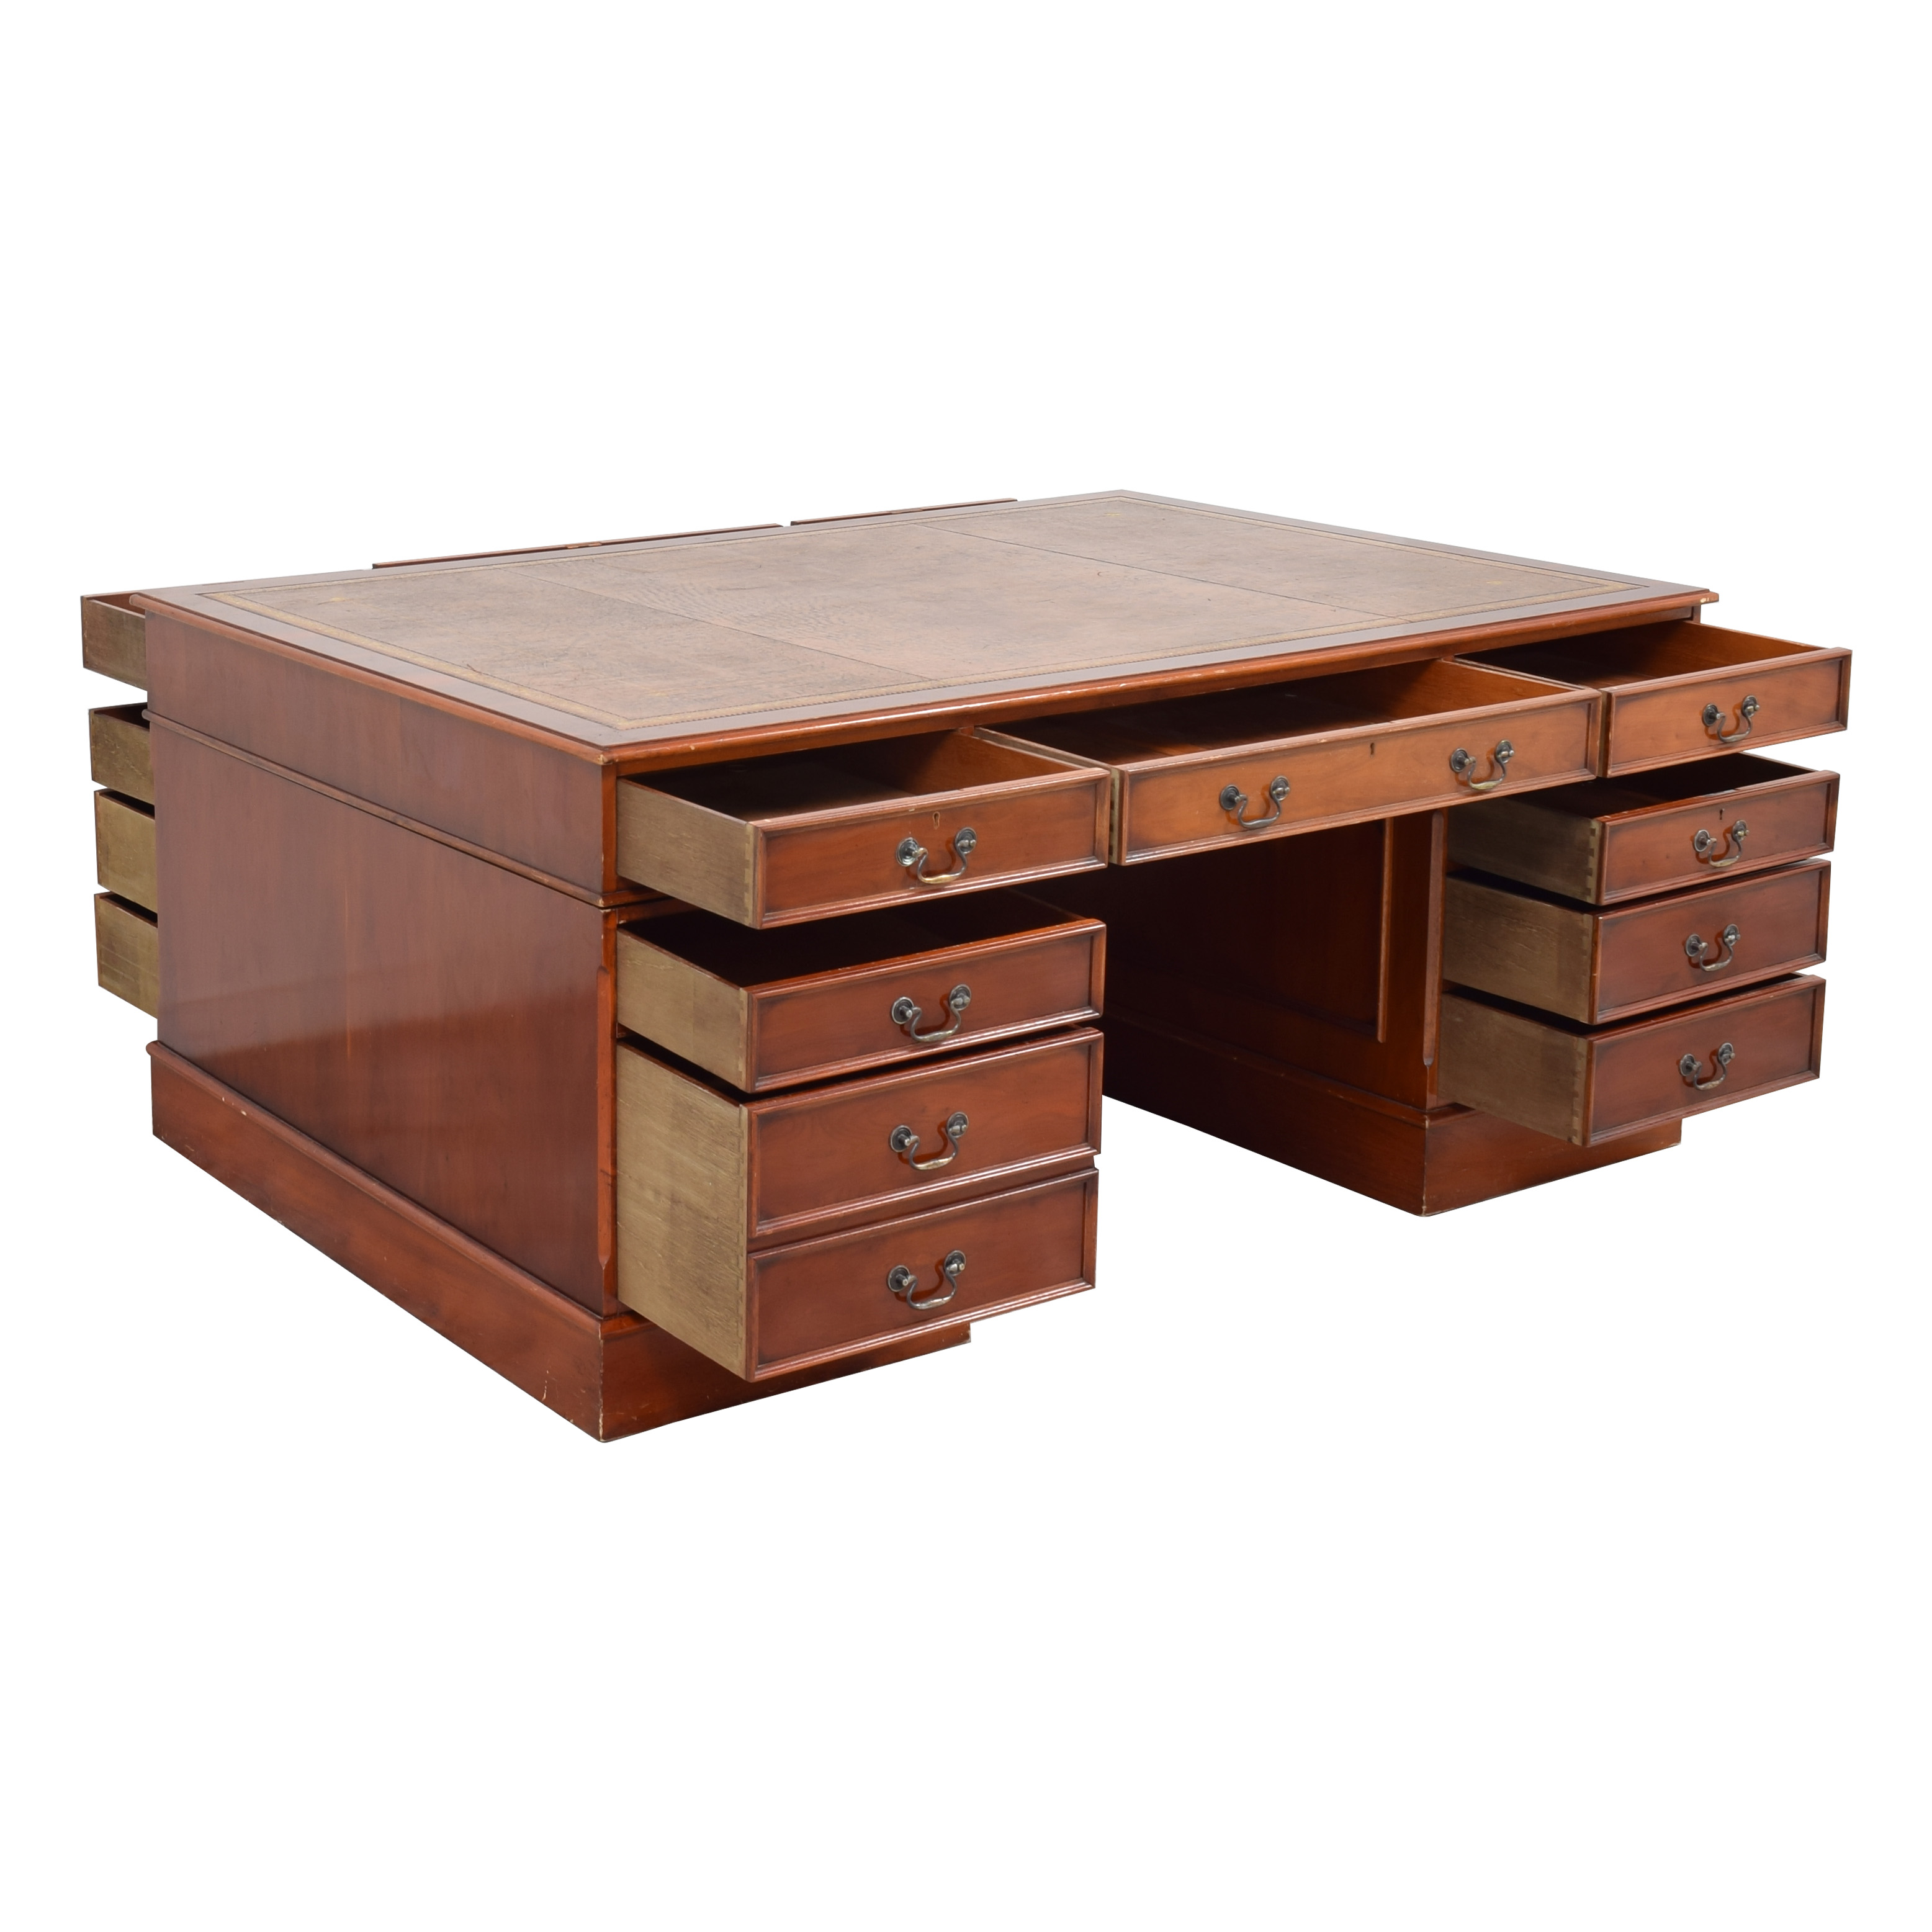 Vintage 19th Century Style Partner's Desk second hand